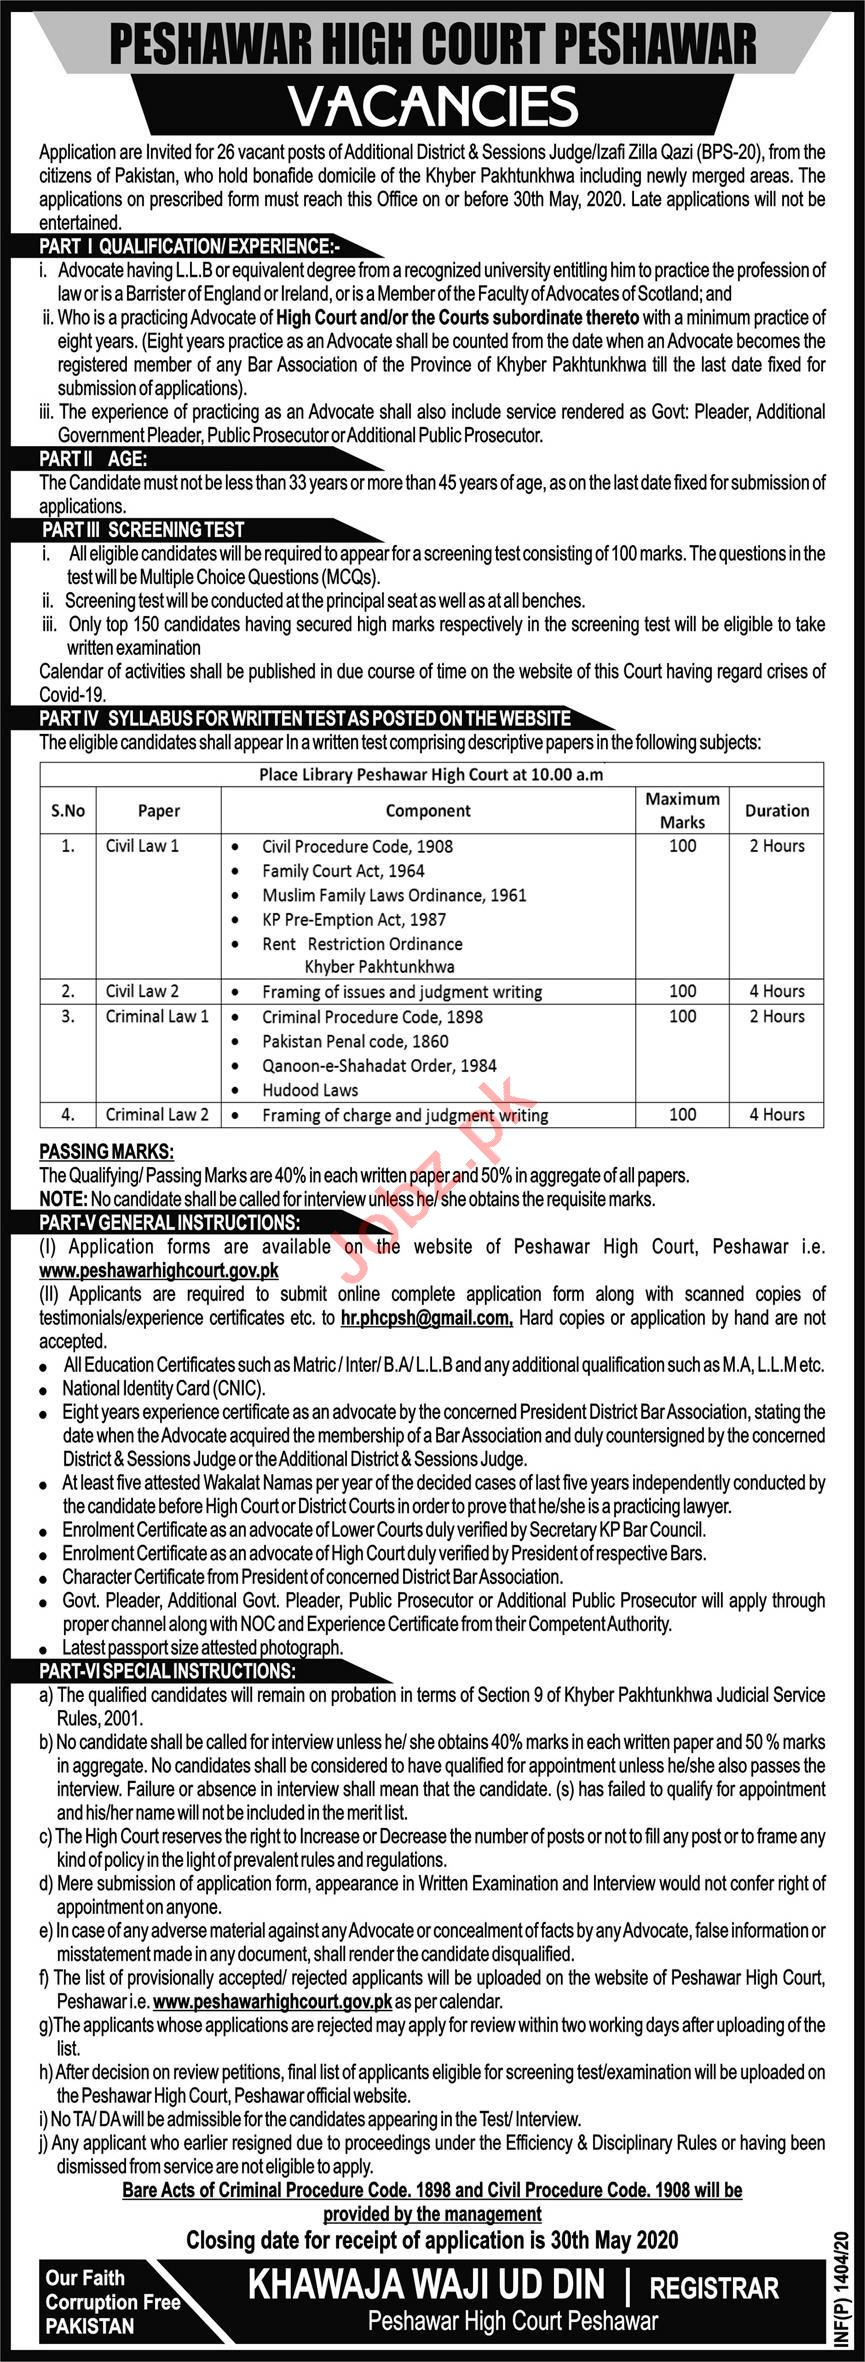 Peshawar High Court Jobs 2020 for Additional District Judge